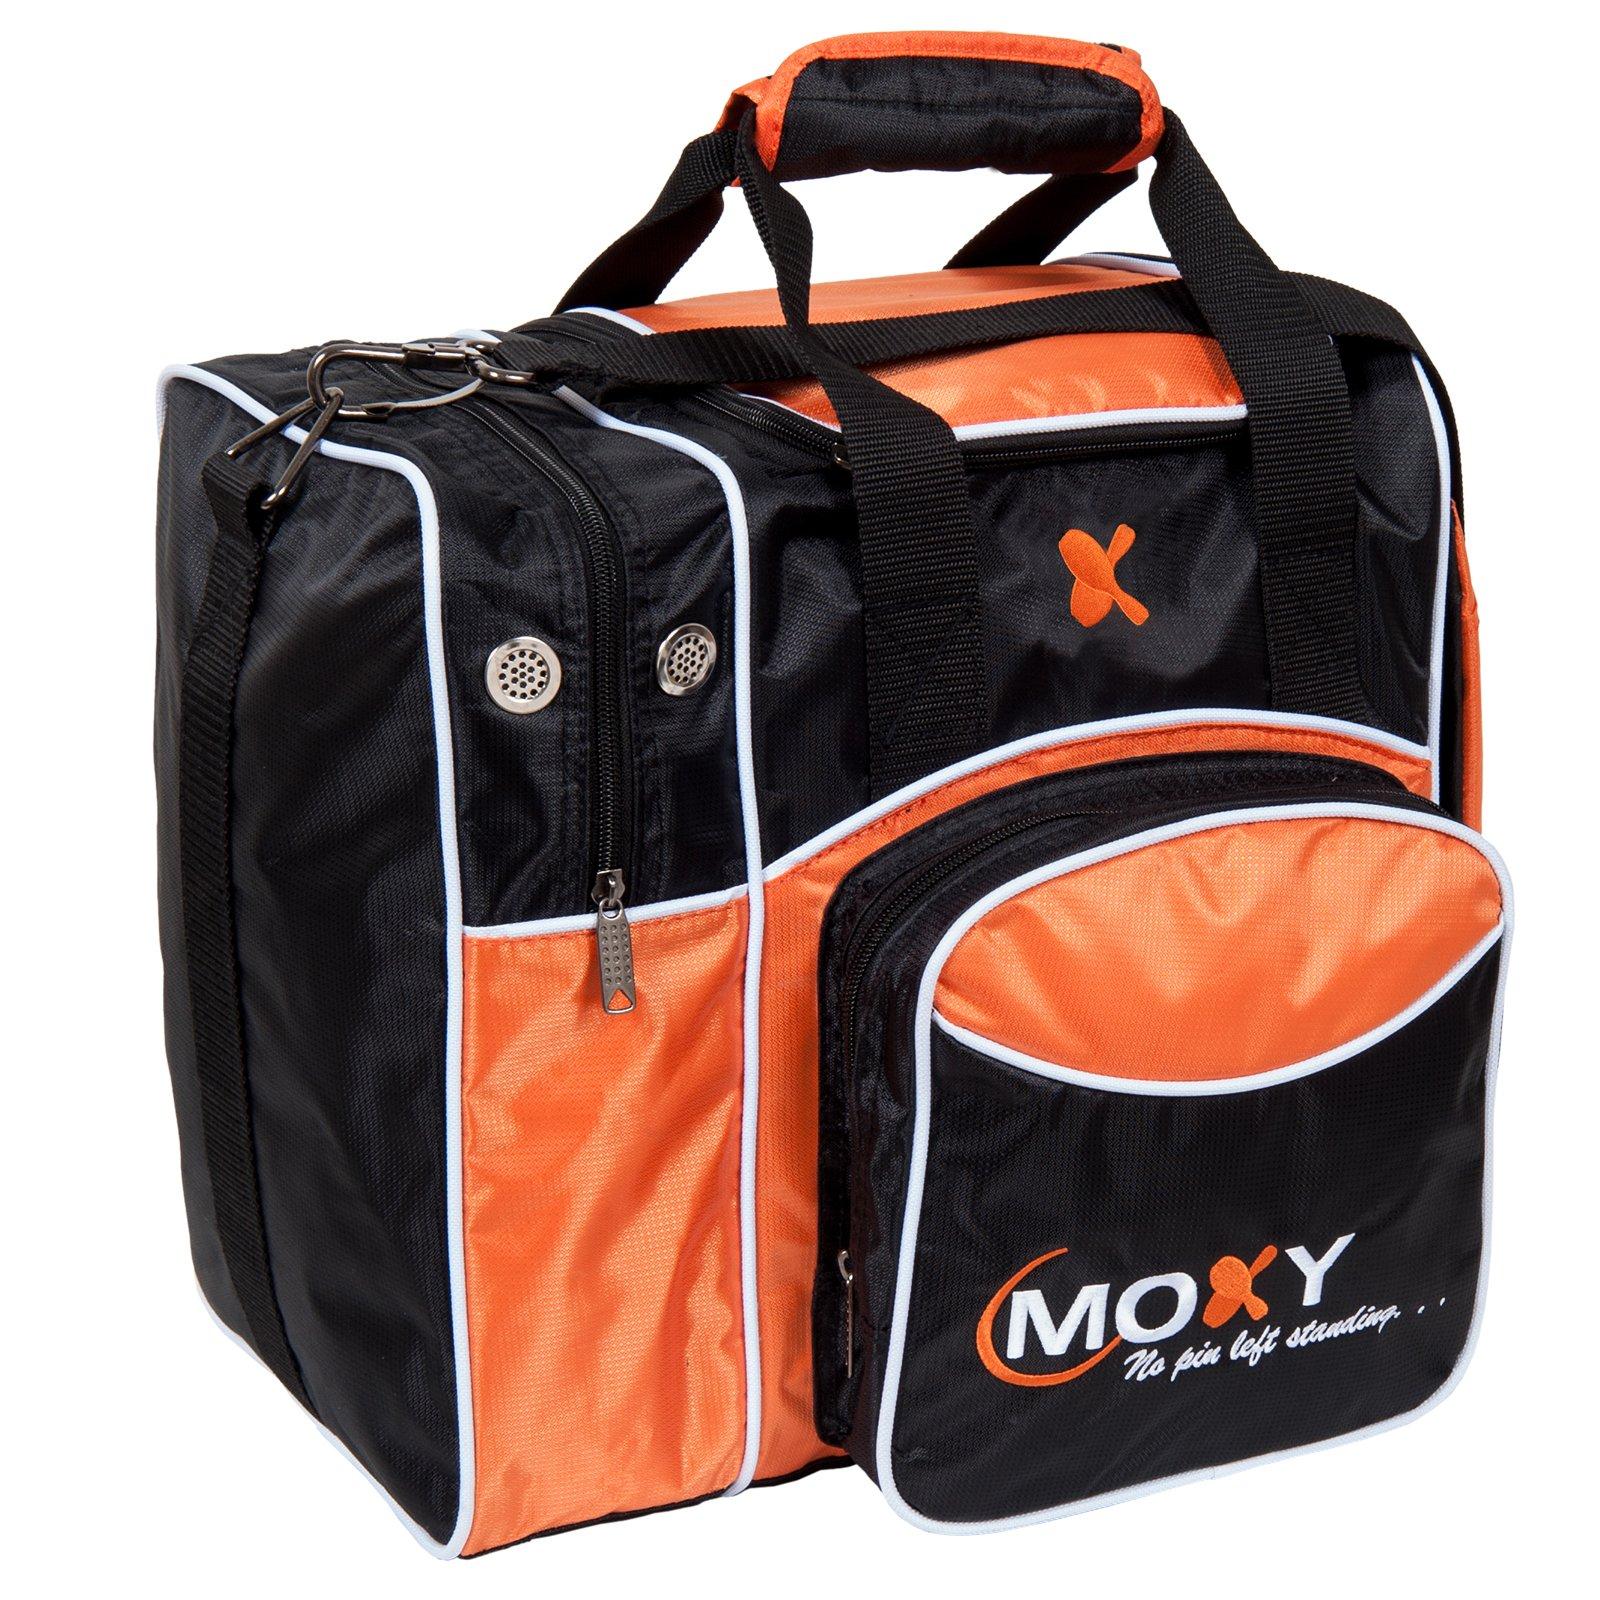 Moxy Deluxe Single Tote Bowling Bag,Orange/Black